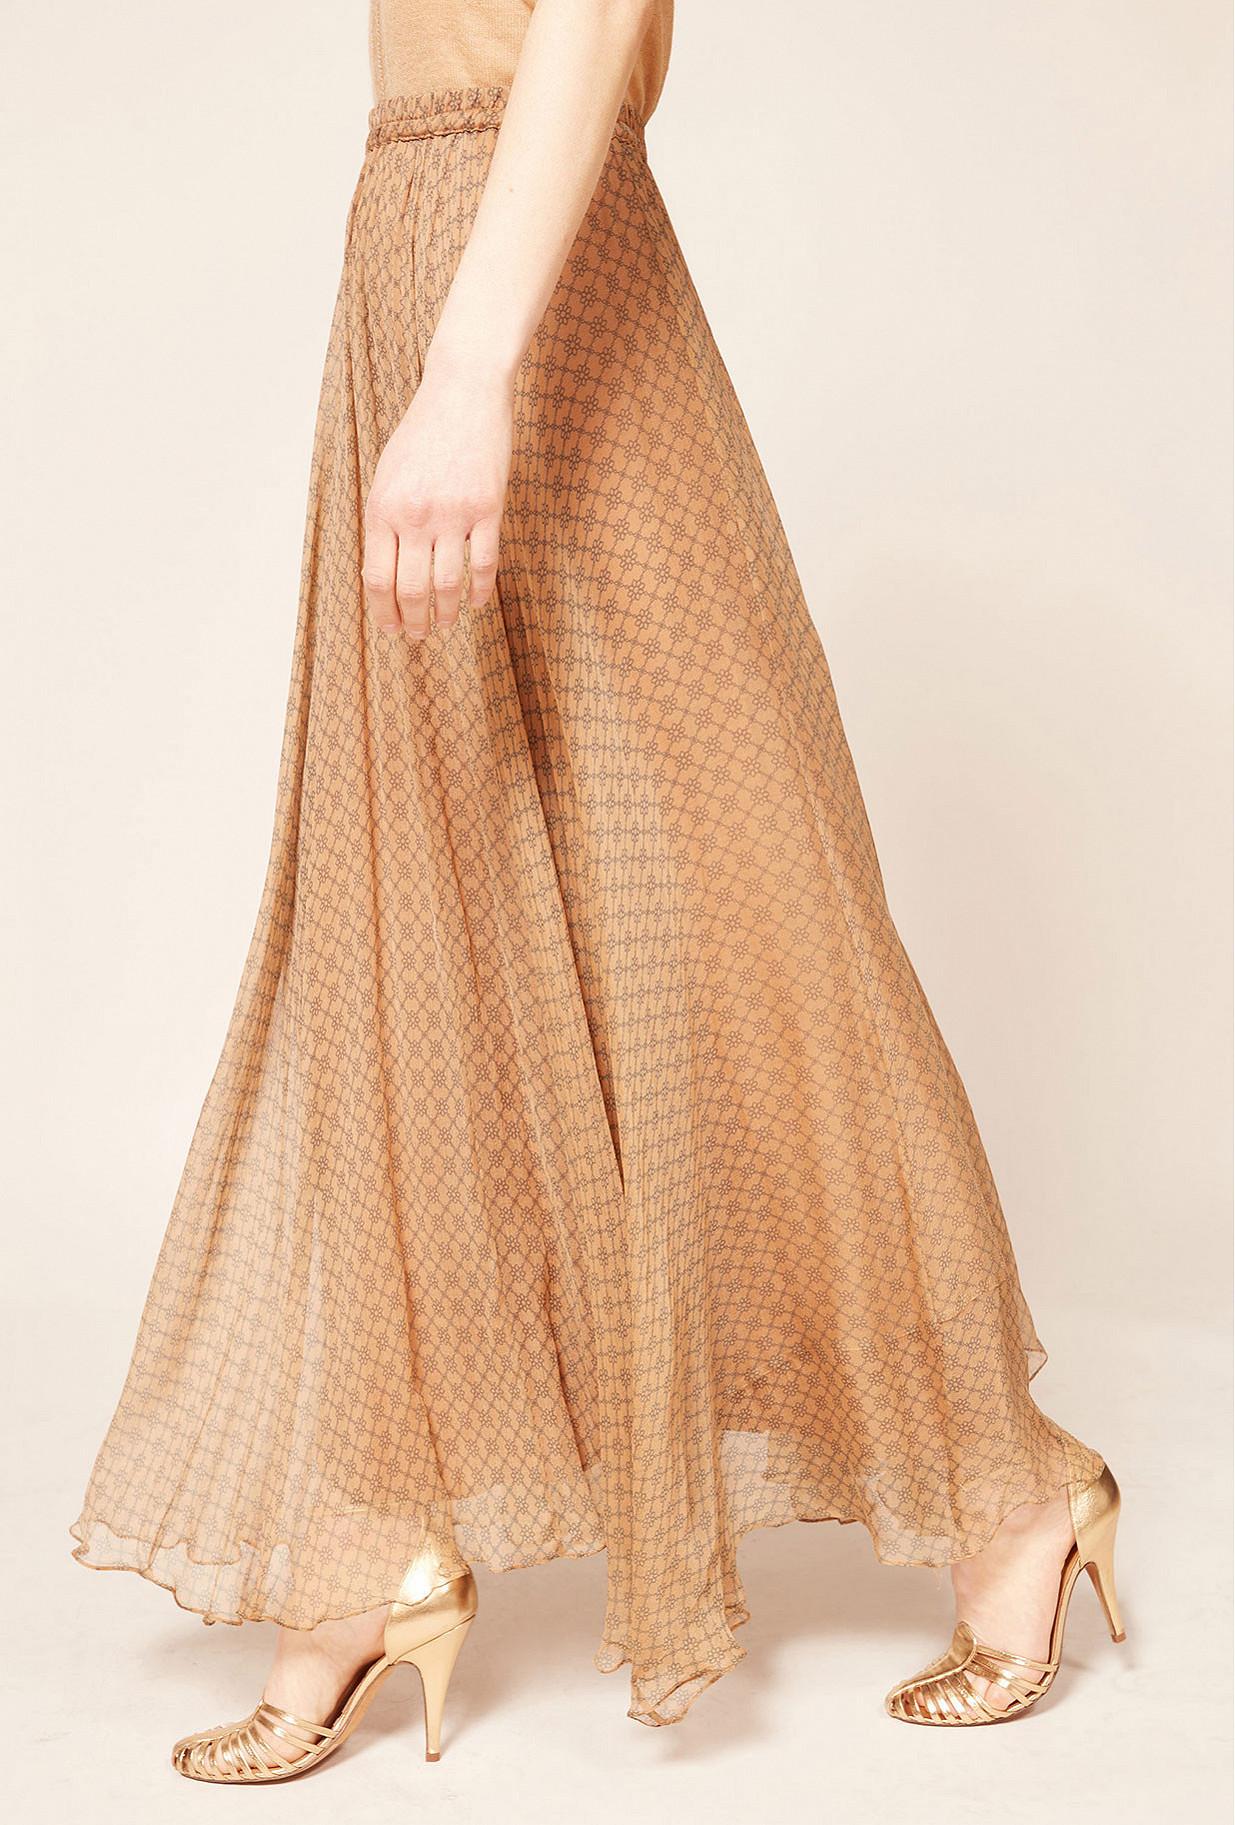 Nude Skirt Trueness Mes Demoiselles Paris